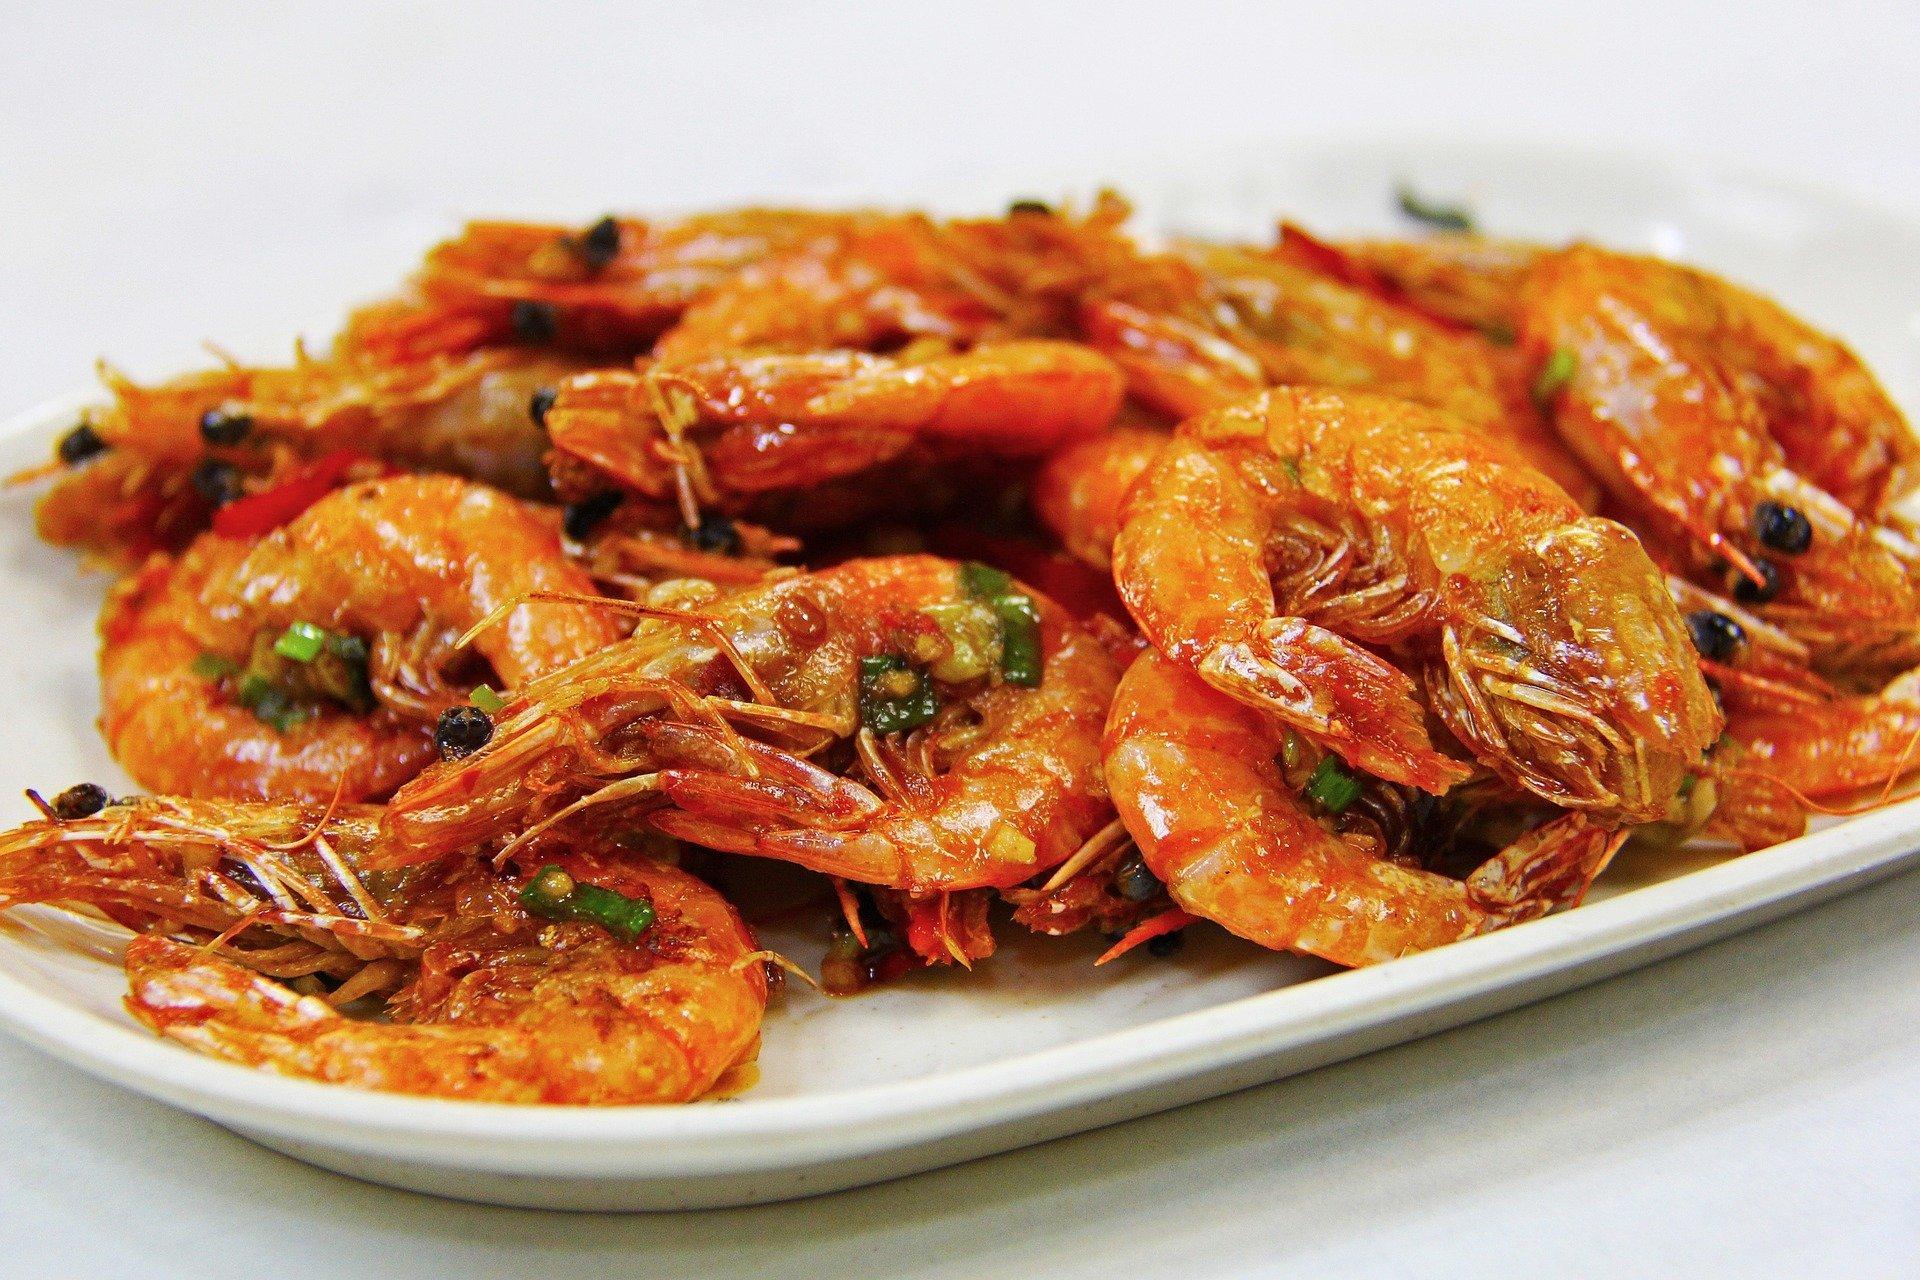 Easy Airfryer recipes for Spicy Garlic Prawns